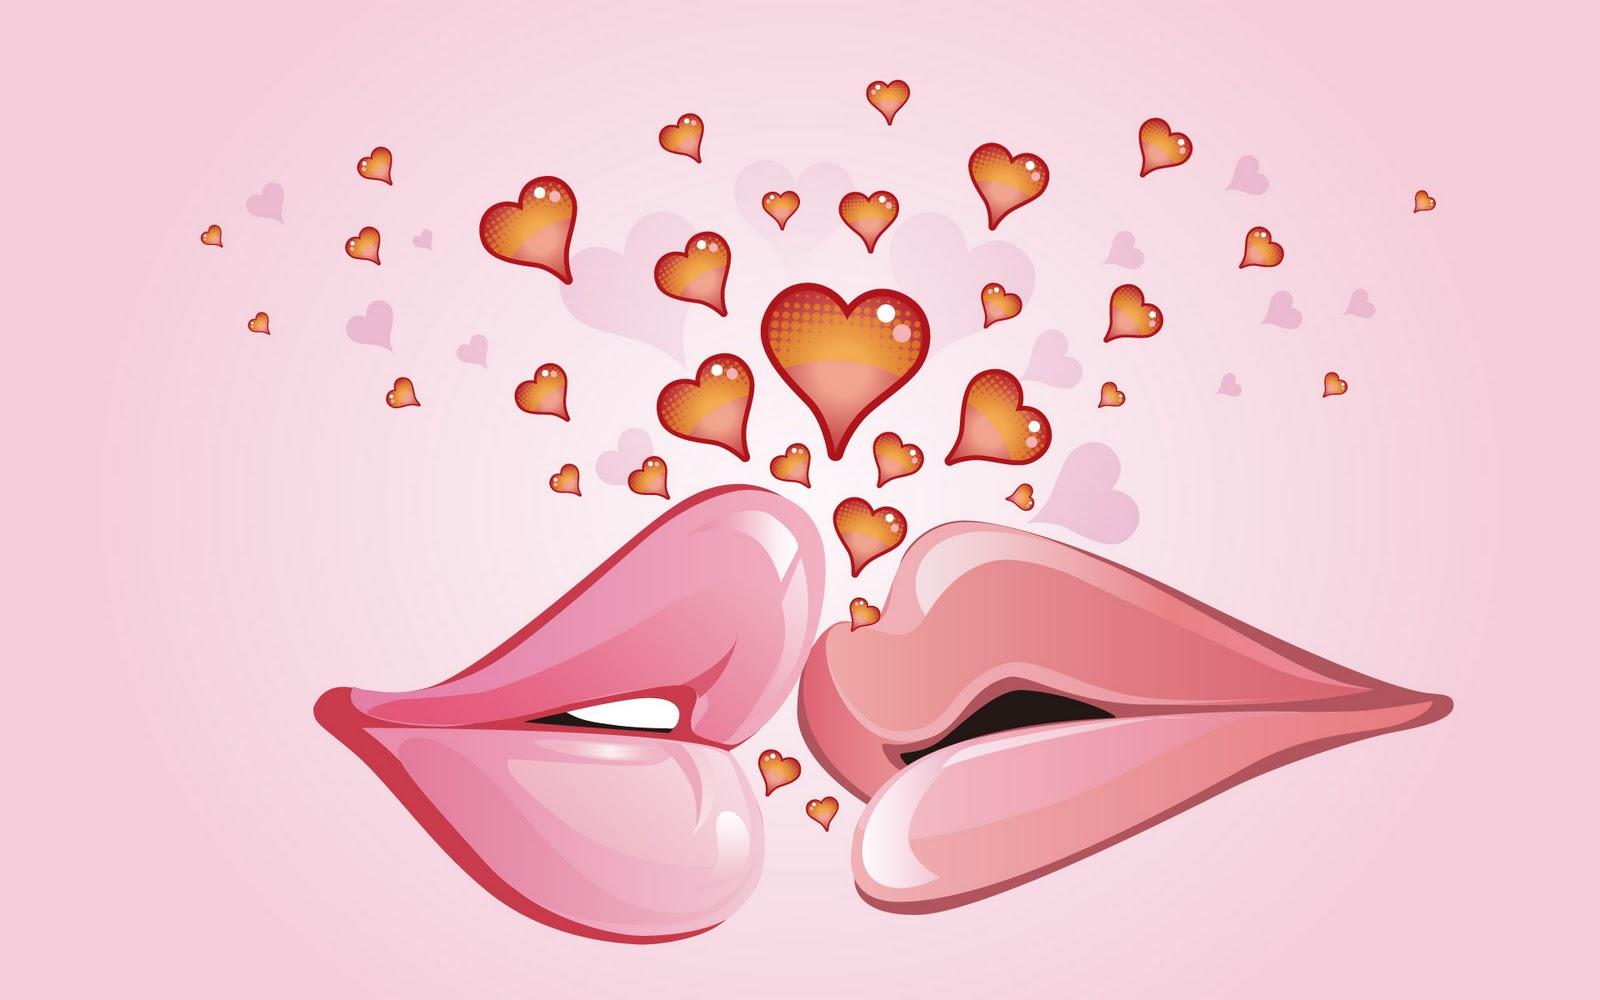 http://2.bp.blogspot.com/-XGCEcUGBOq0/TnSRTPtRSUI/AAAAAAAAAsg/gwojWpYeqHc/s1600/Love+Pictures+%252838%2529.jpg